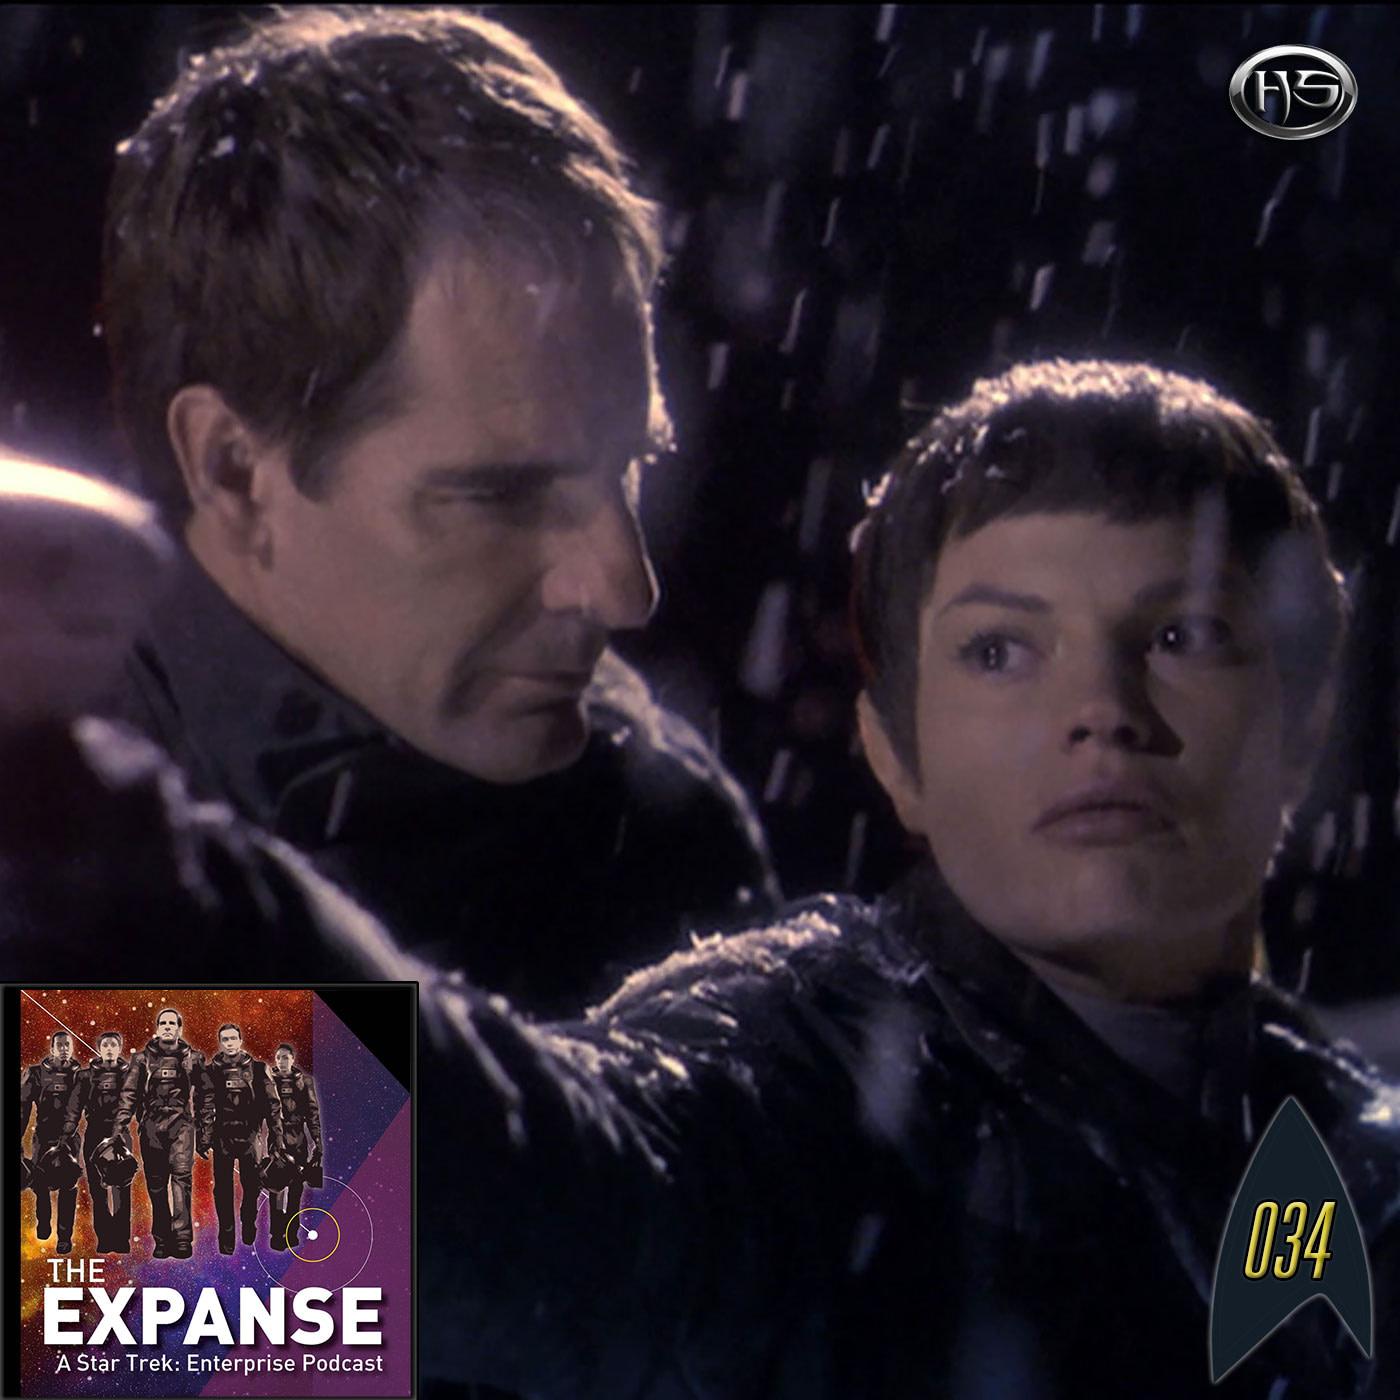 The Expanse Episode 34